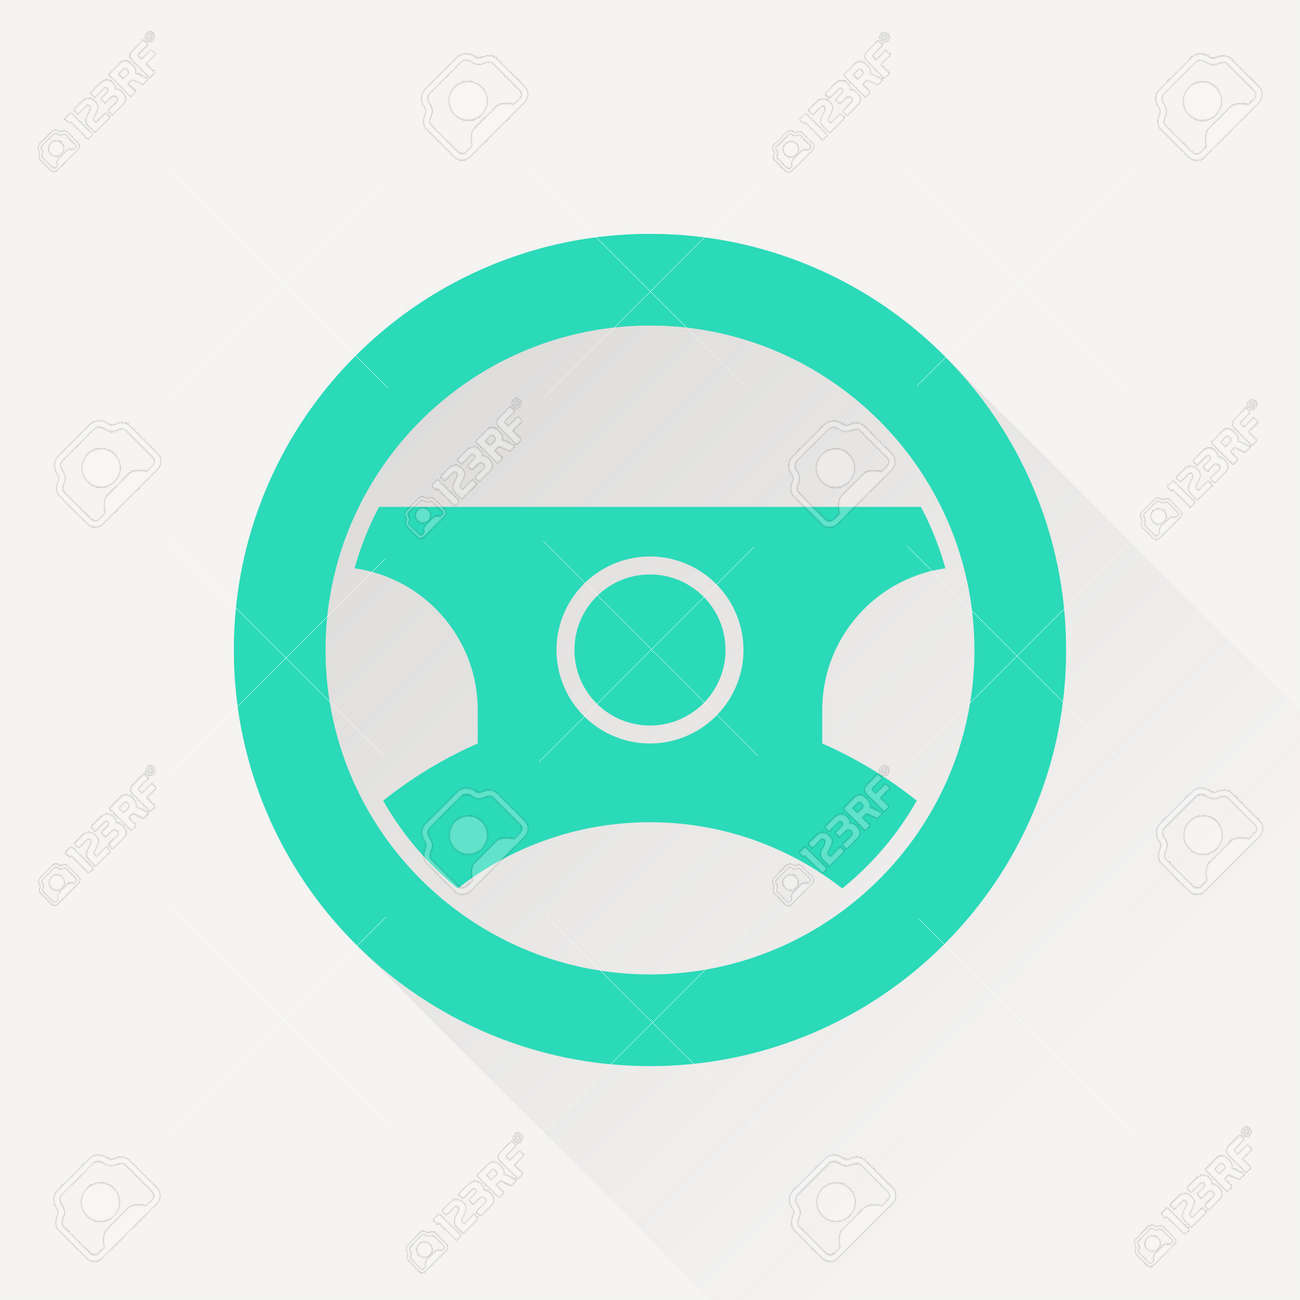 Car Steering Wheel Symbol Vector Hmi Dashboard Flat Icon Royalty - Car image sign of dashboardcar dashboard icons stock images royaltyfree imagesvectors